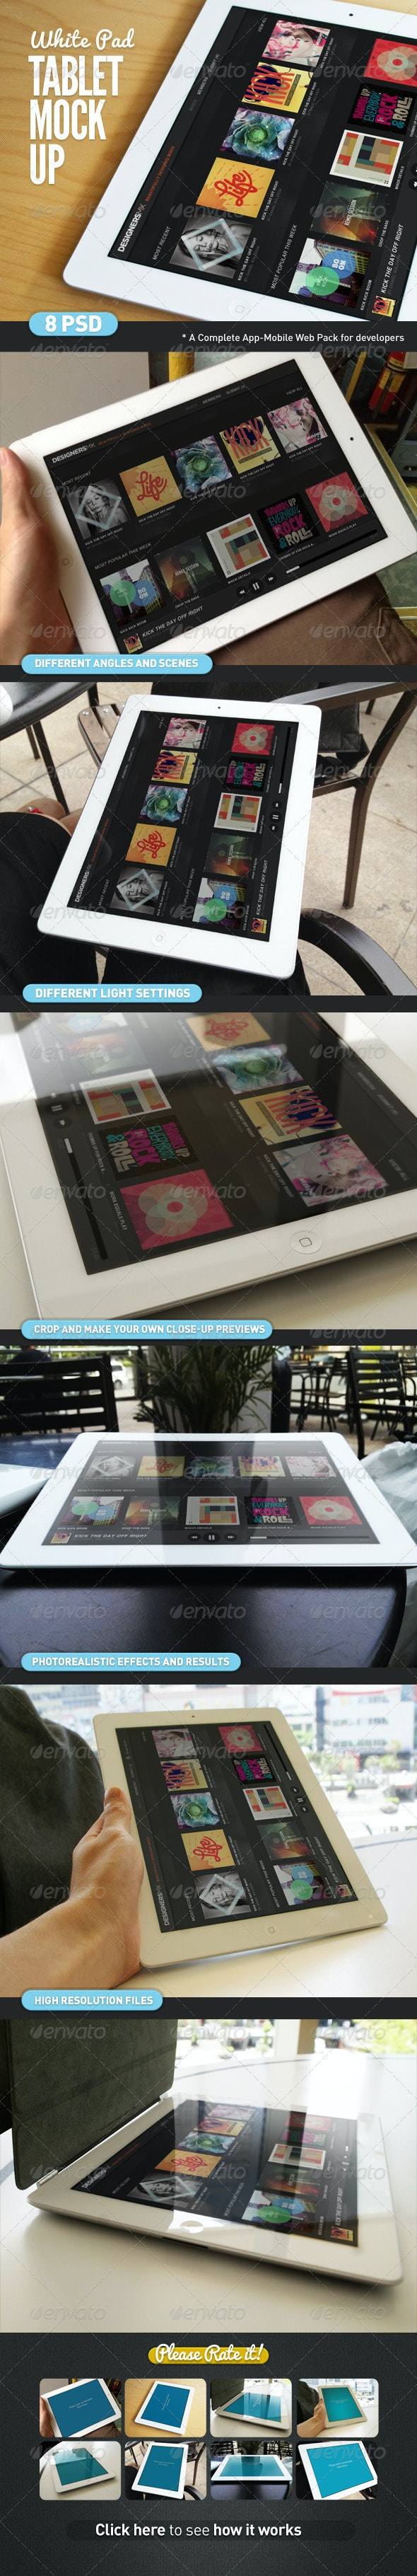 Tablet App White Pad Mock-Up - Mobile Displays